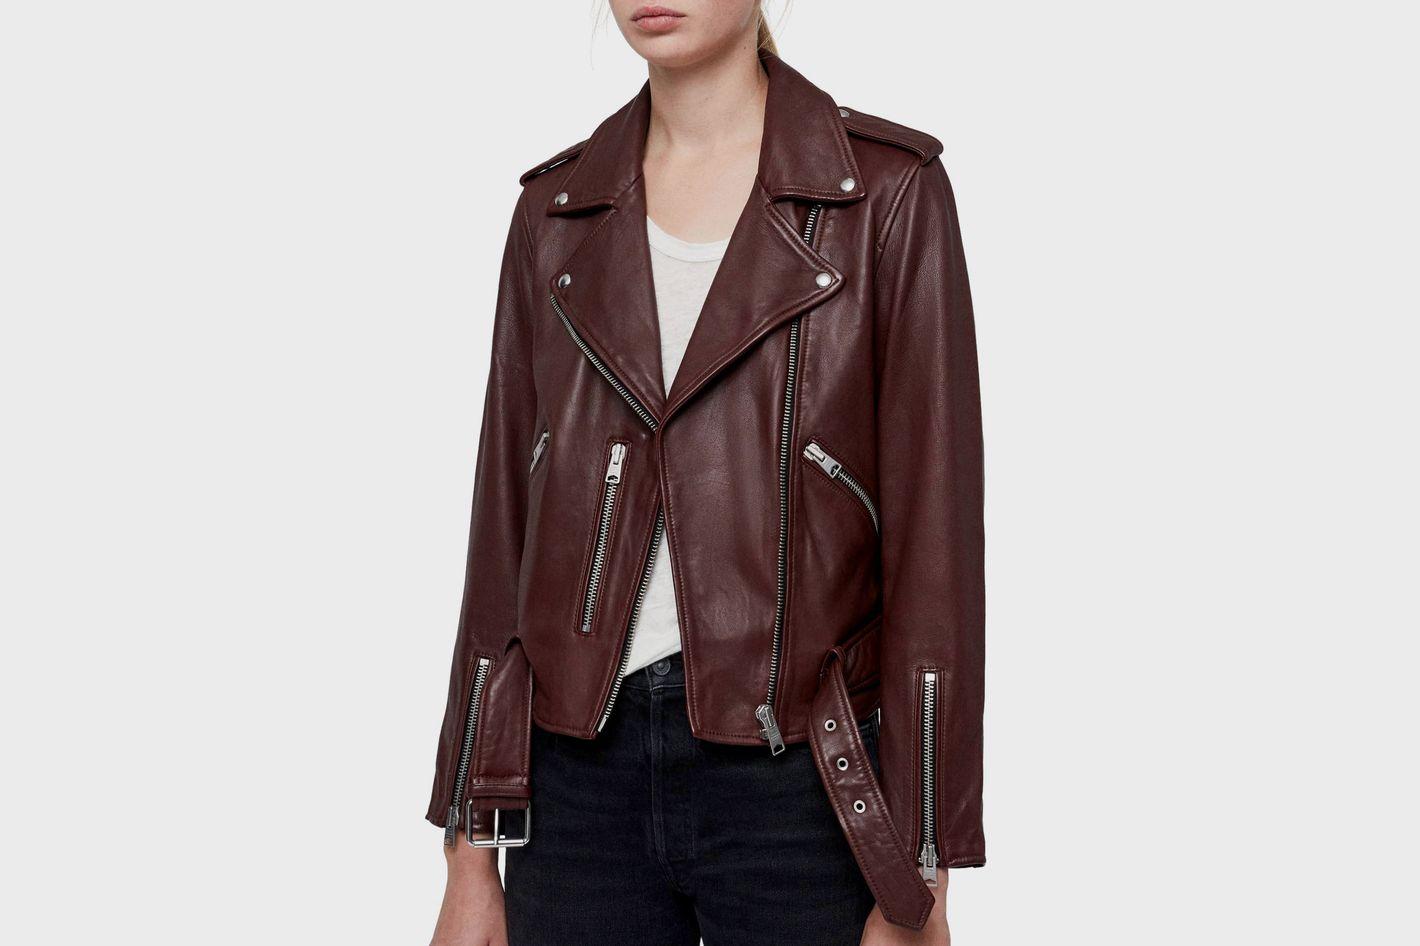 69884c9bf6e3f ALLSAINTS Balfern Leather Biker Jacket at Nordstrom